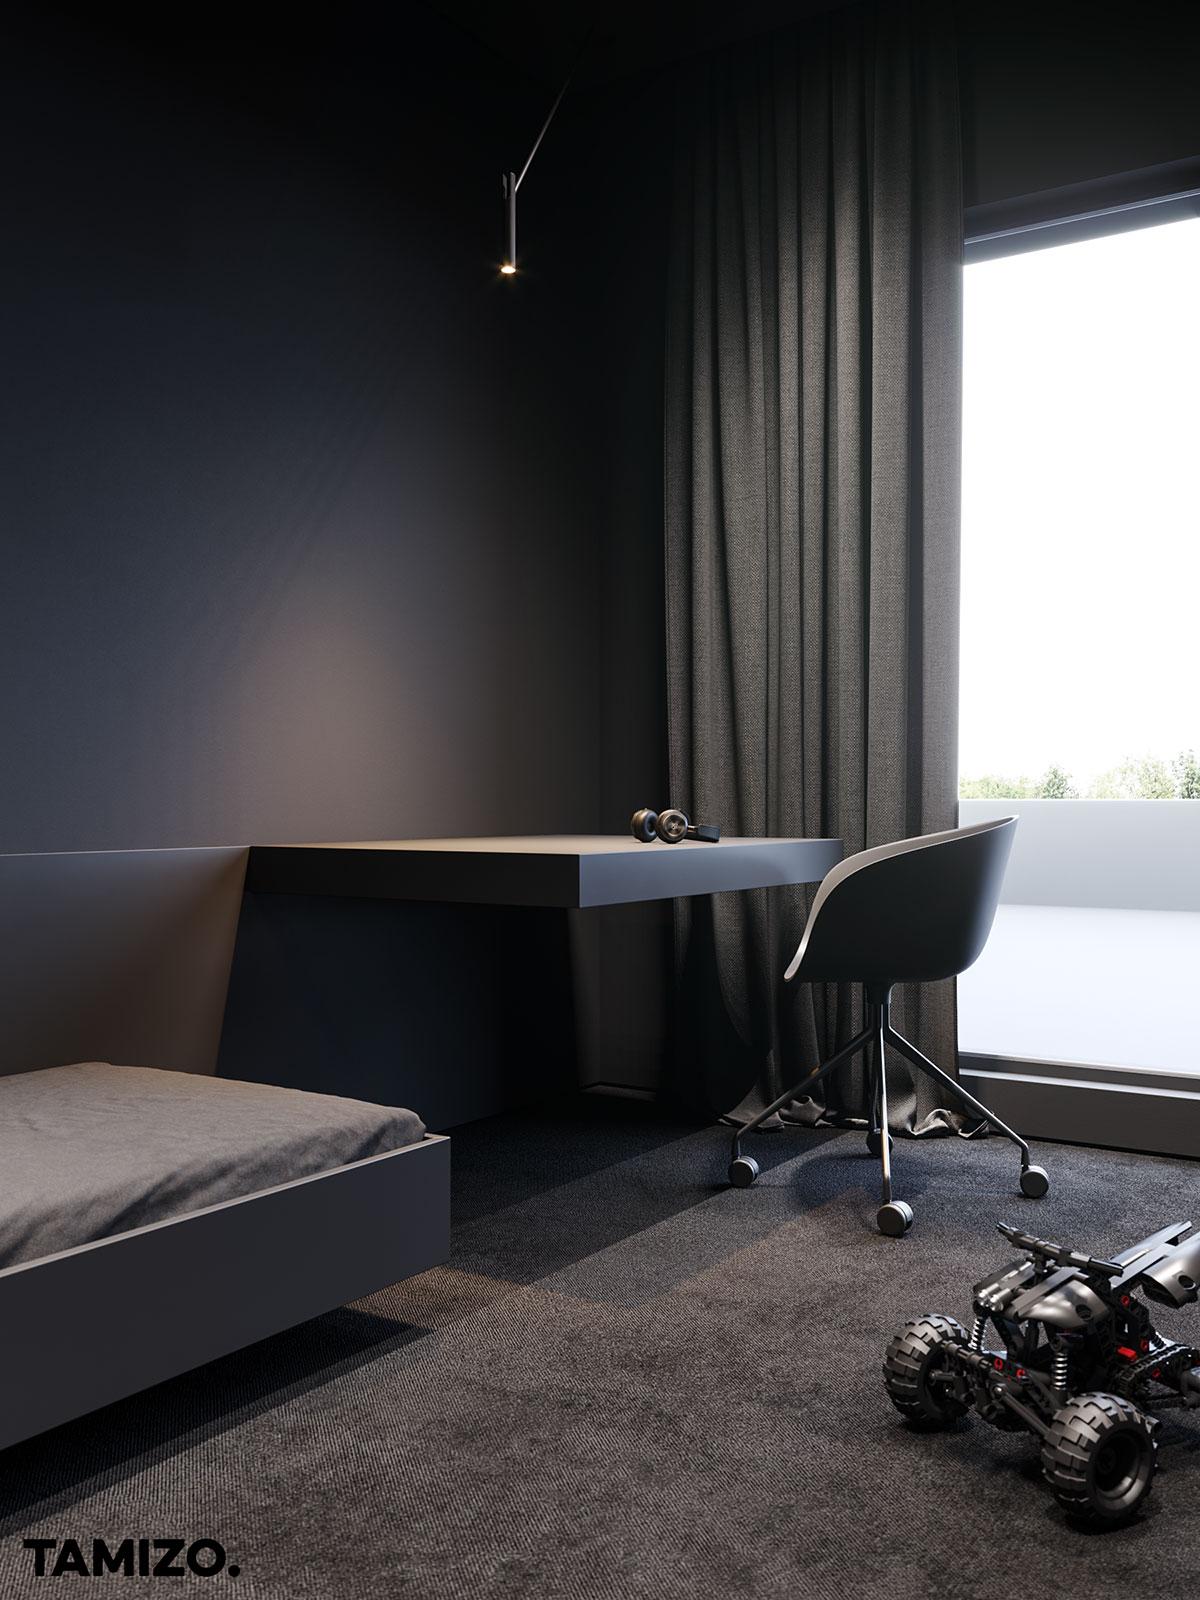 tamizo_architects_mateusz_kuo_stolarski_poznan_iterior_design_apartment_penthouse_14